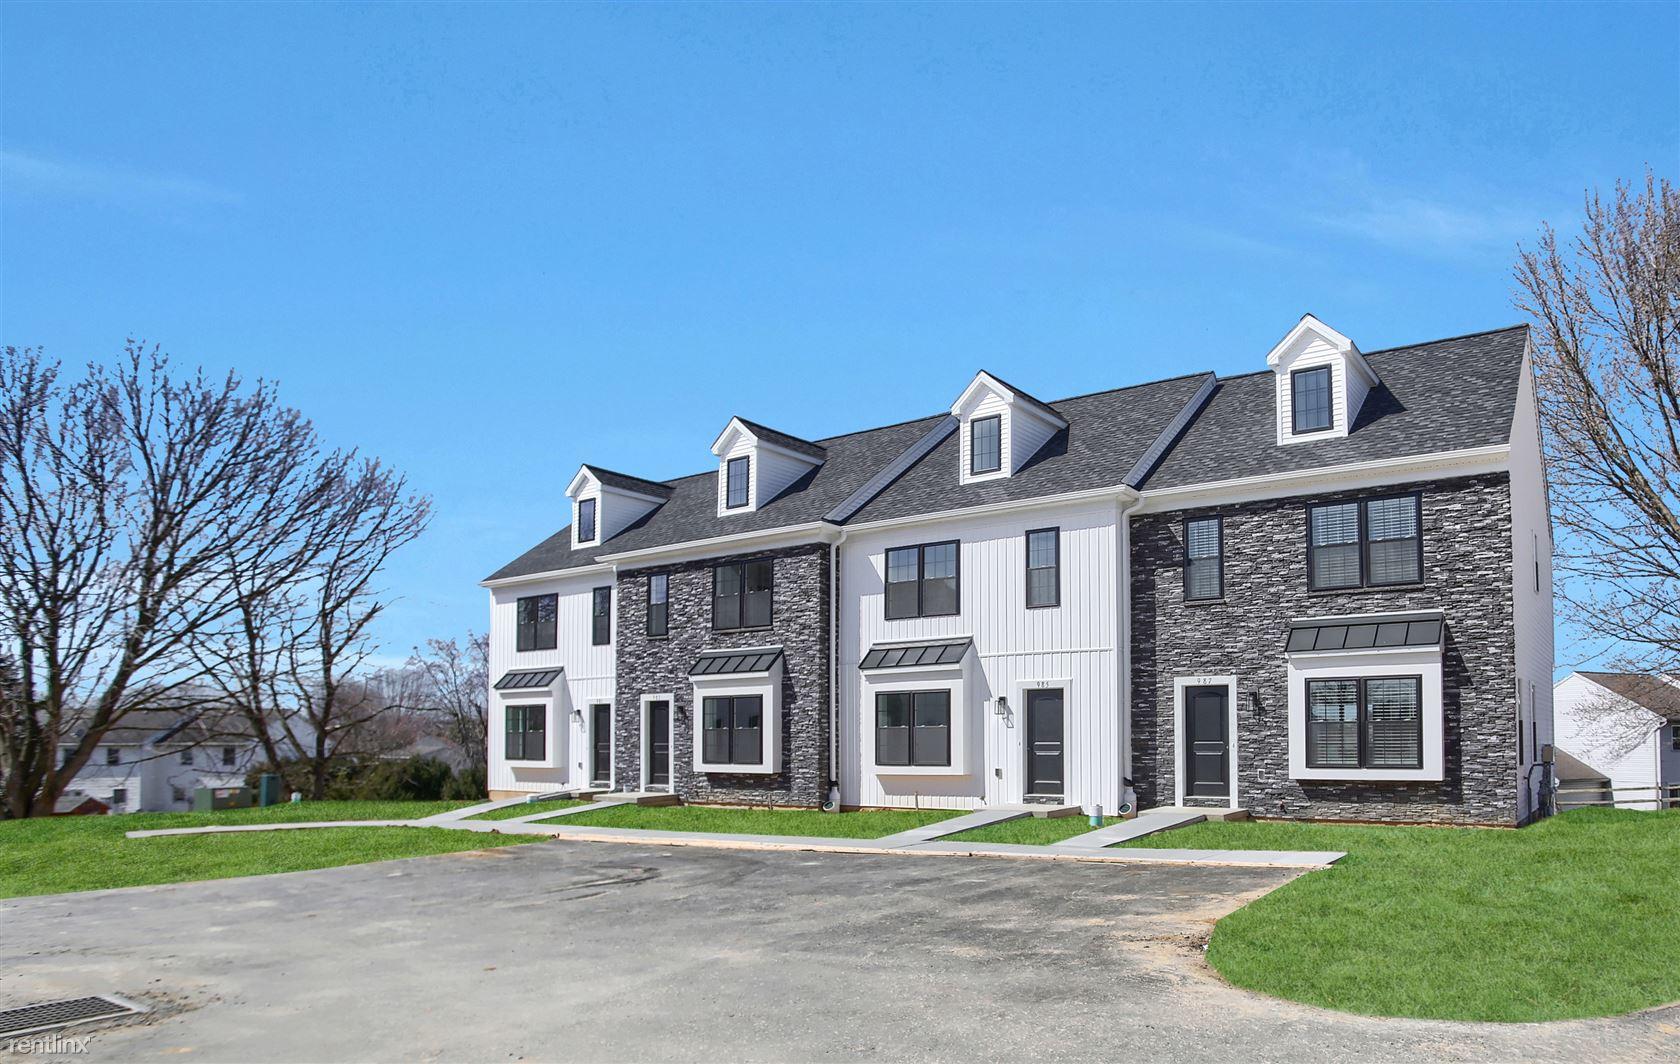 973 Old Elizabethtown Rd, Elizabethtown, PA - $1,695 USD/ month